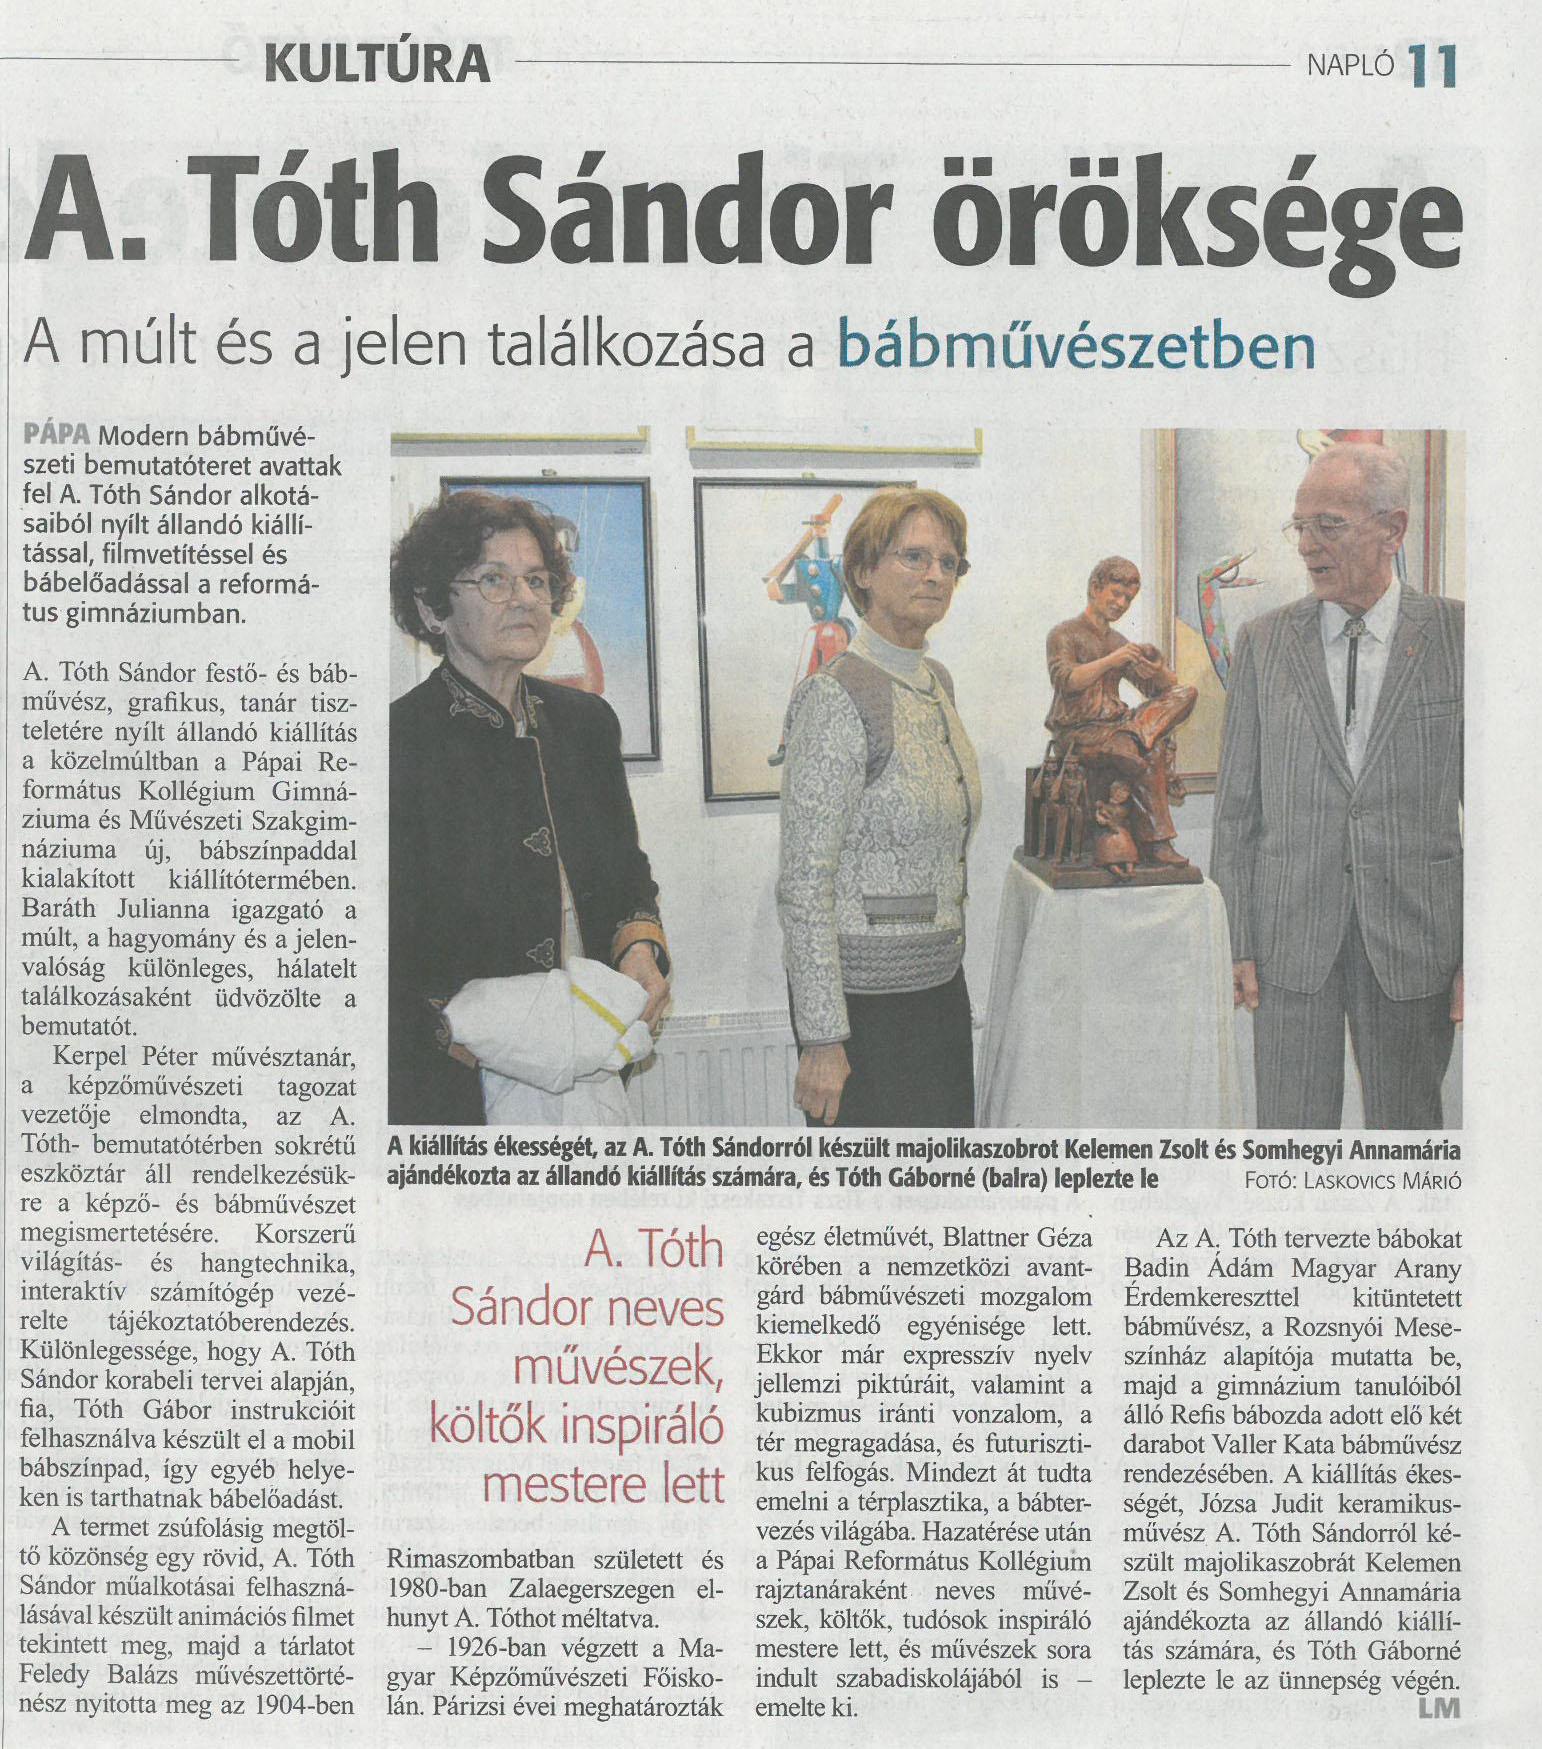 A. Tóth Sándor öröksége